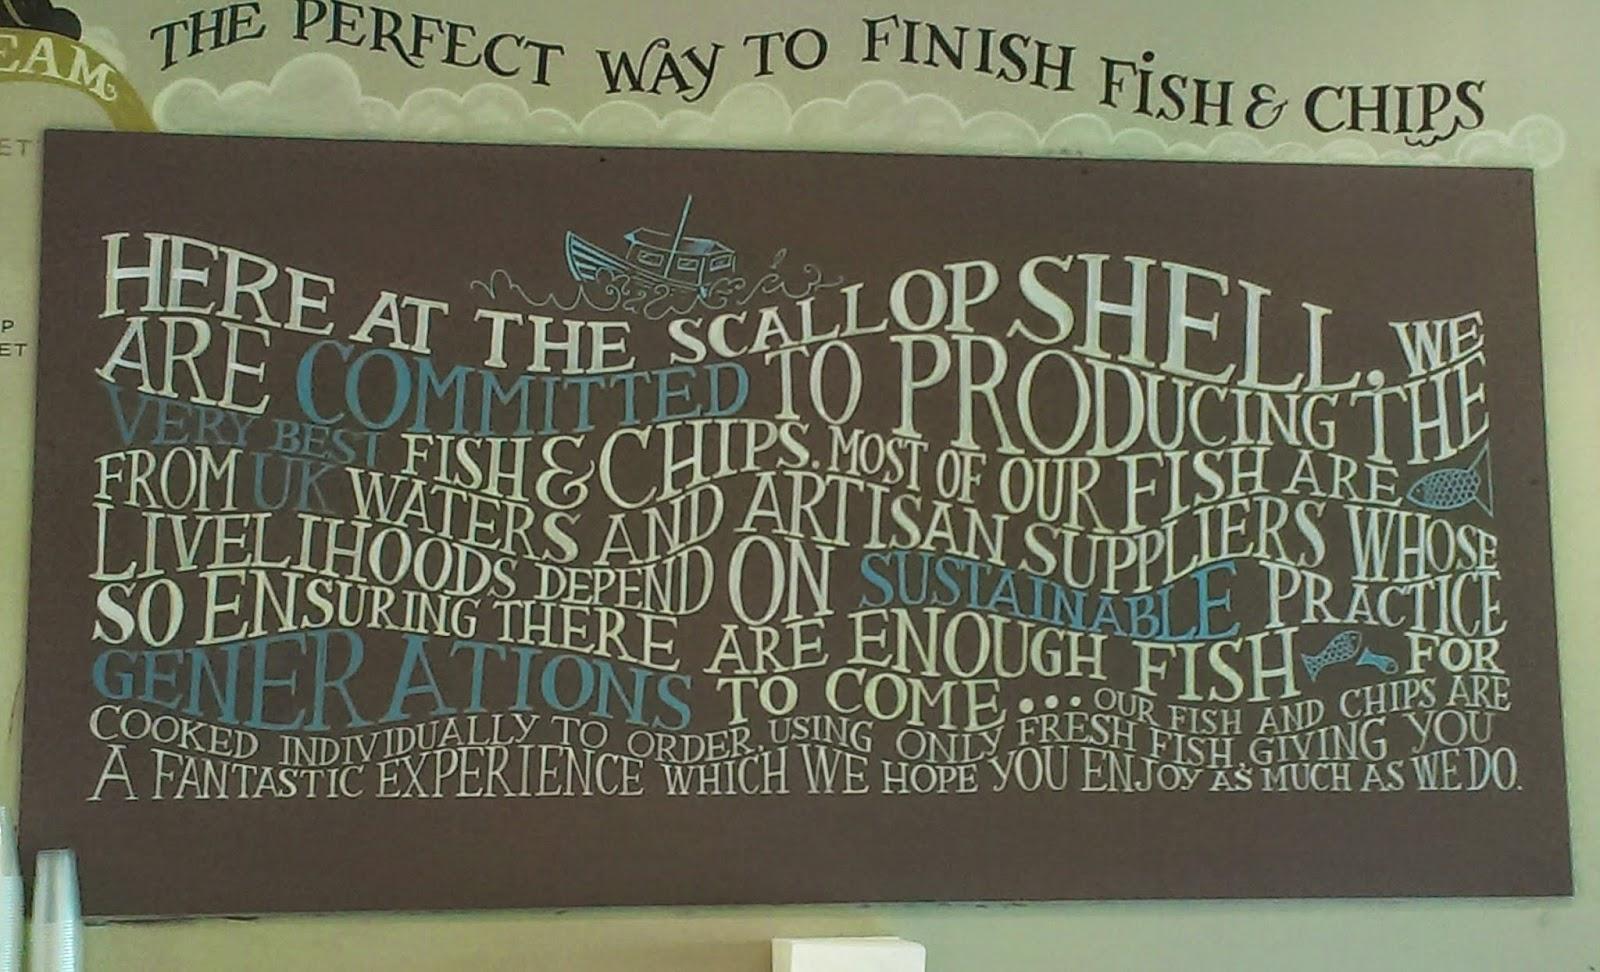 The Scallop Shell Beckington Ethos